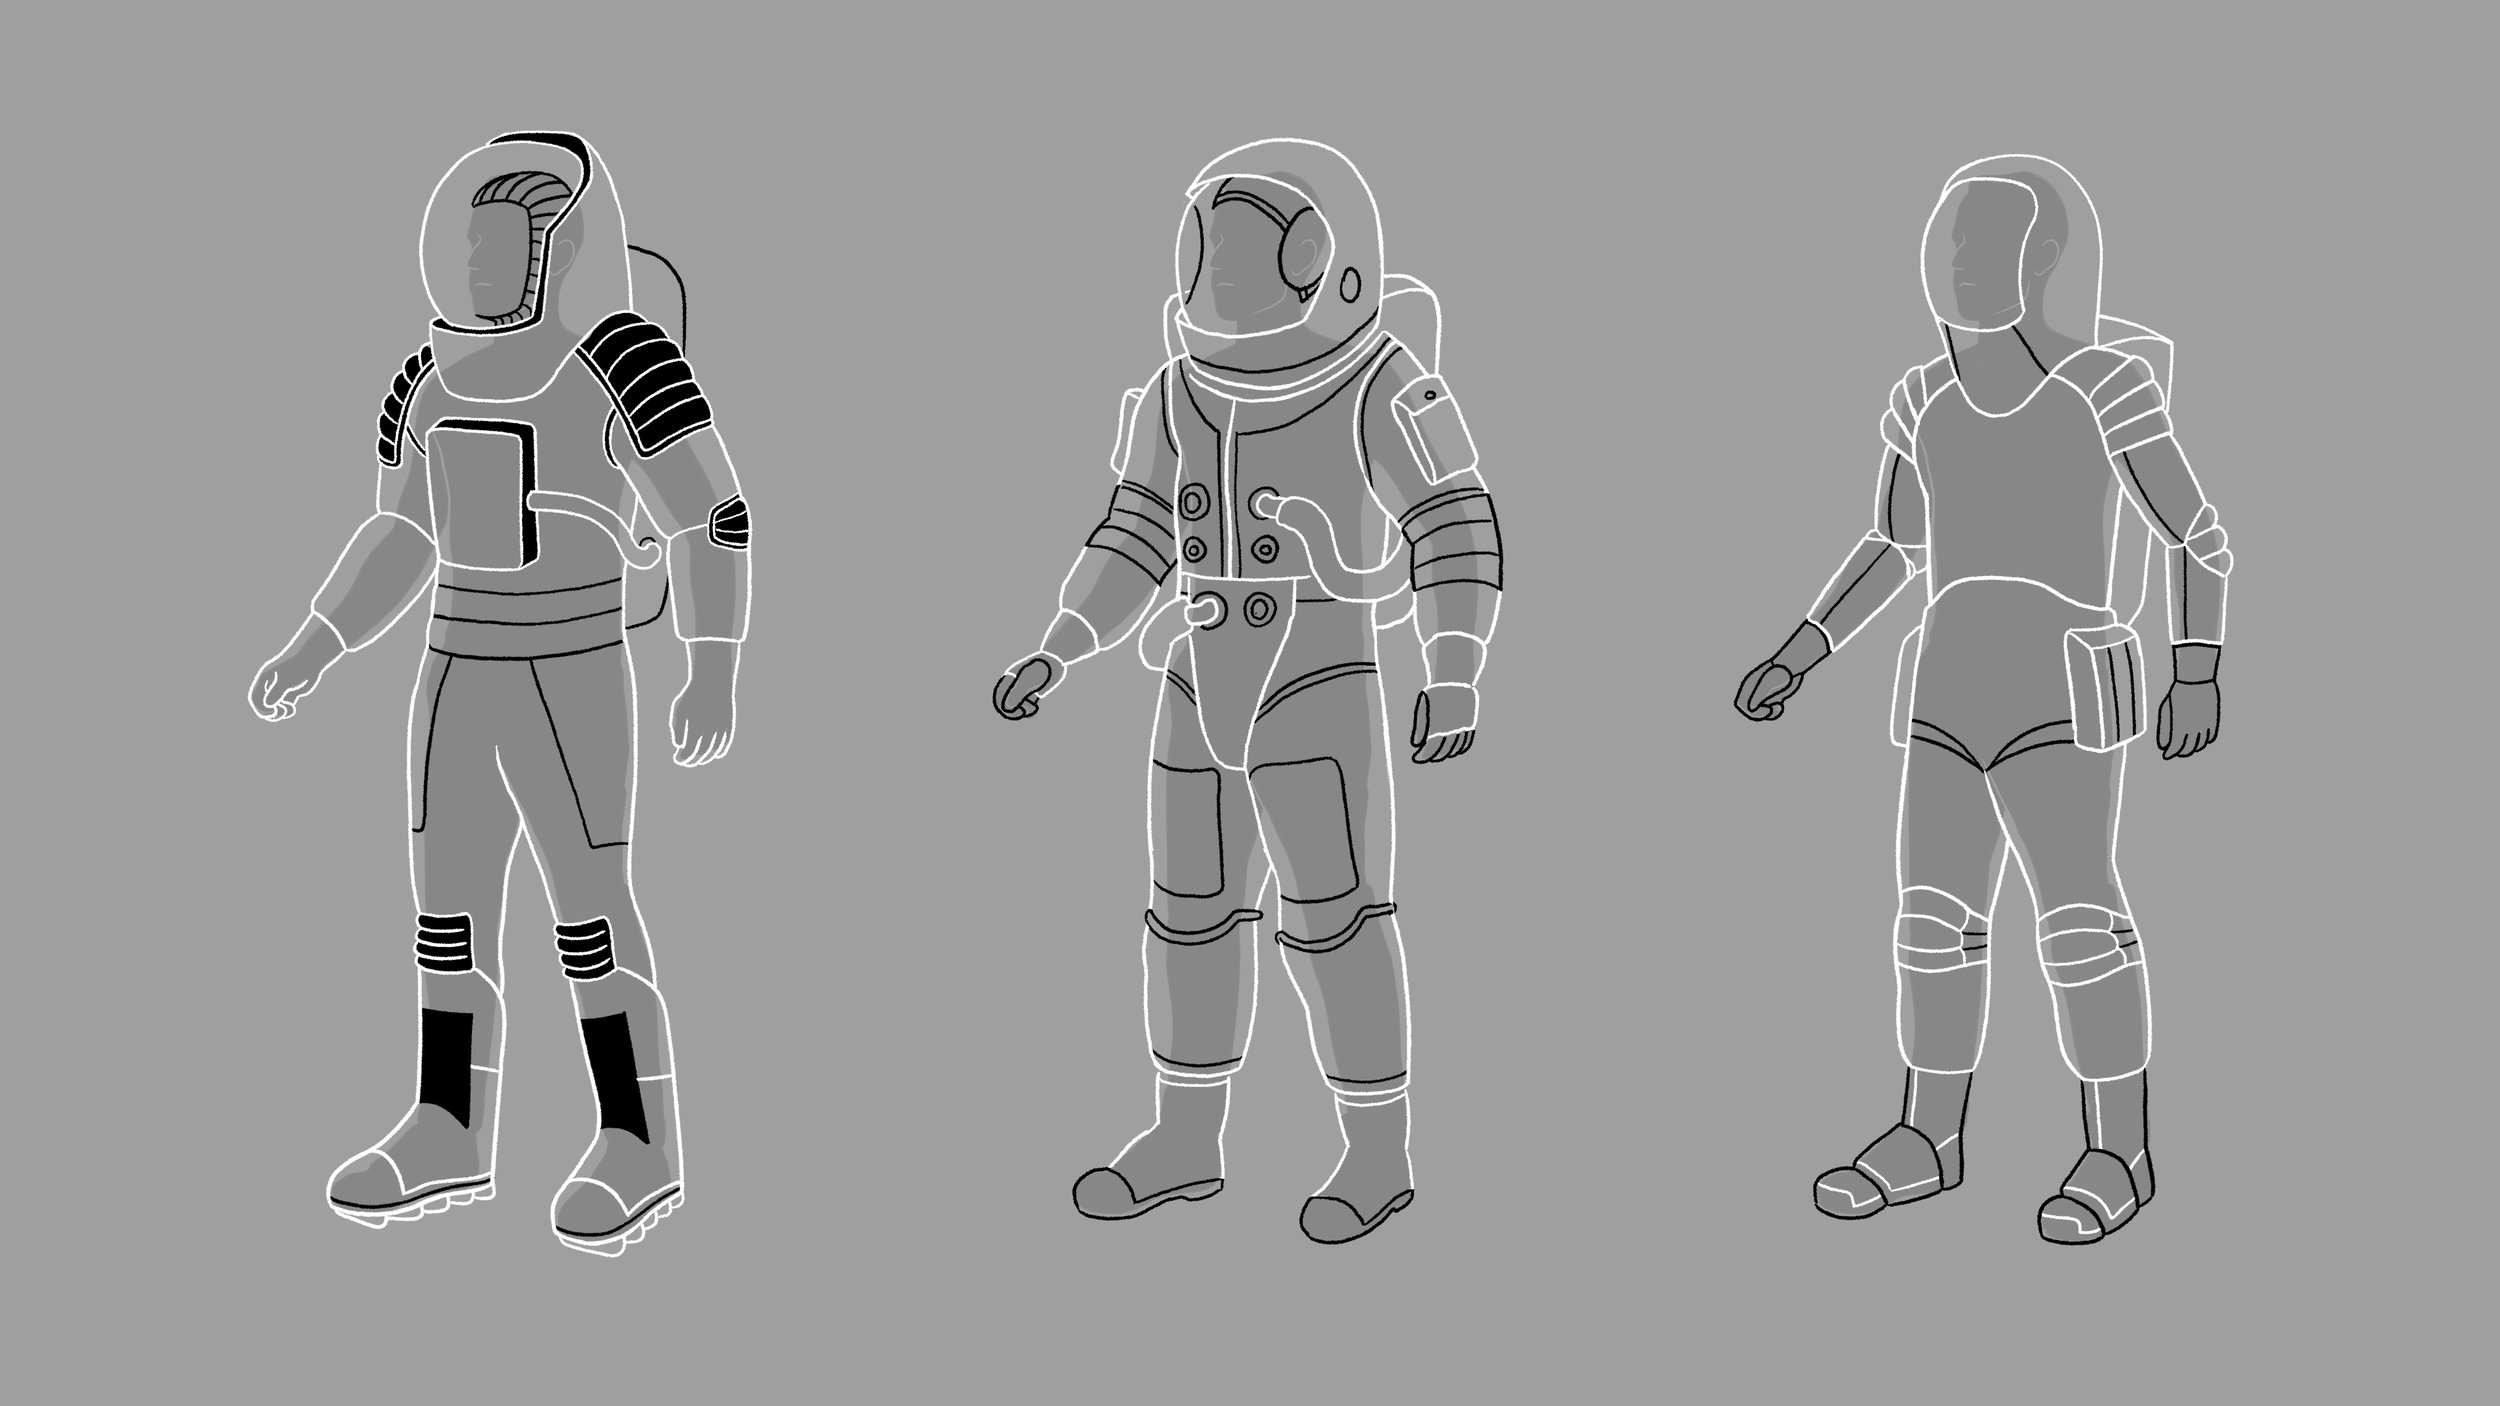 Astronauts_004.jpg